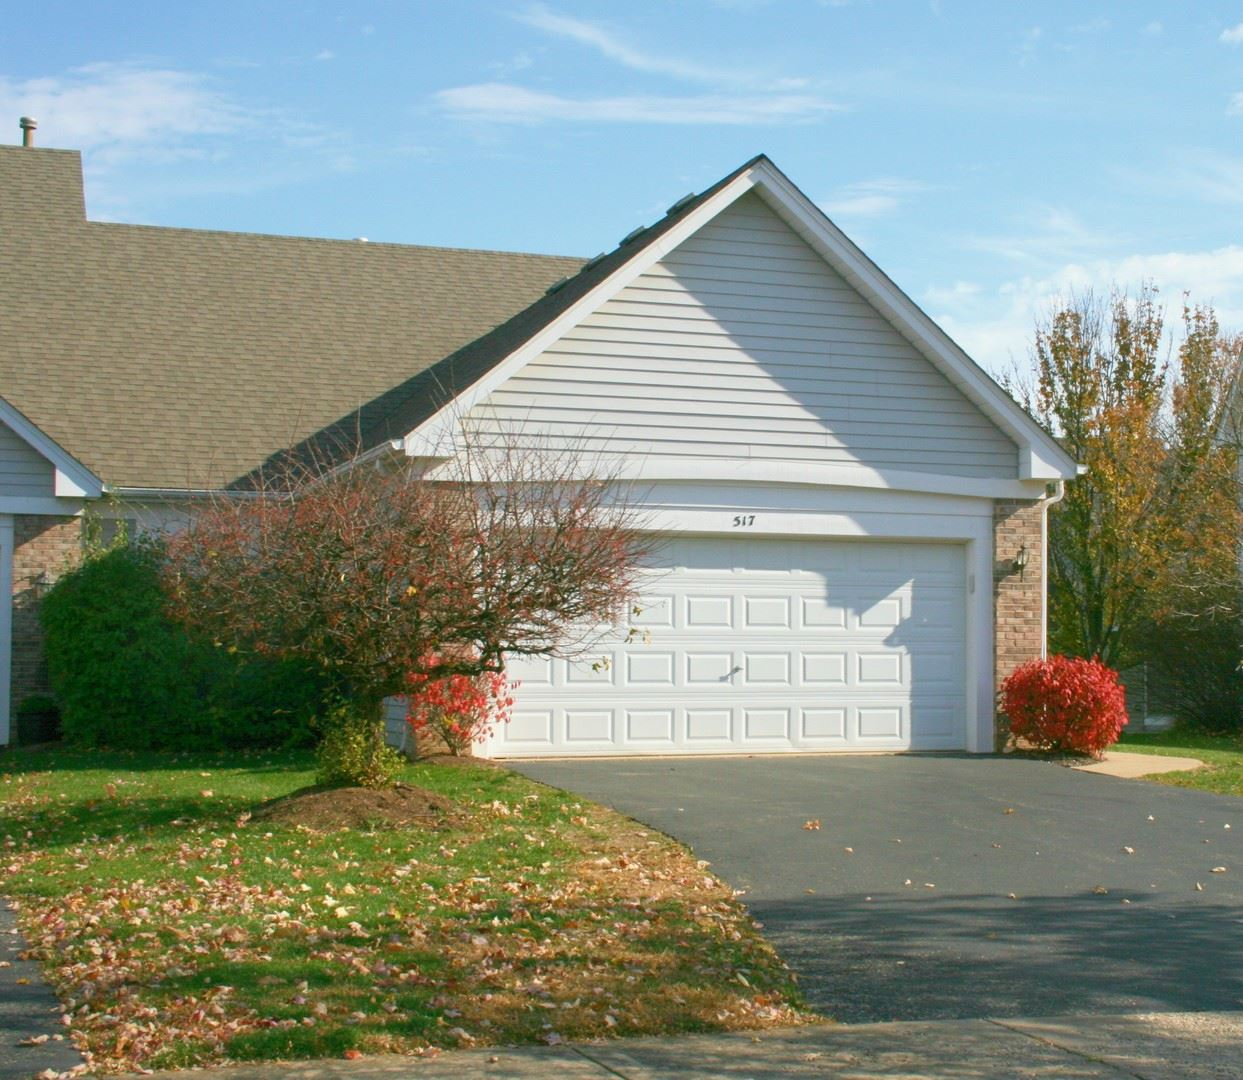 Photo of 517 Northgate Circle, Oswego, IL 60543 (MLS # 10928392)